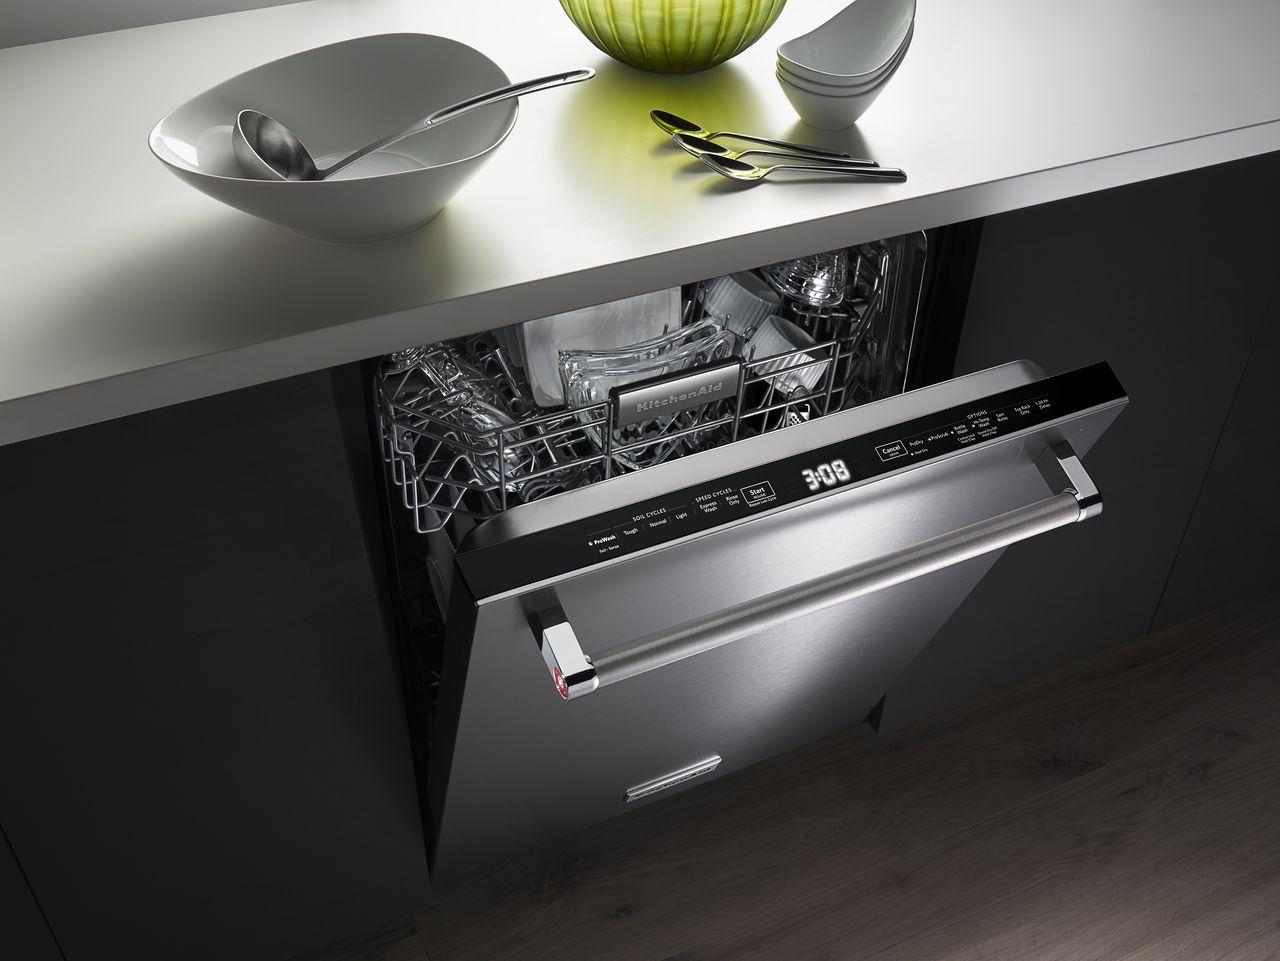 KitchenAid Built-In Stainless Dishwasher - KDTM704ESS